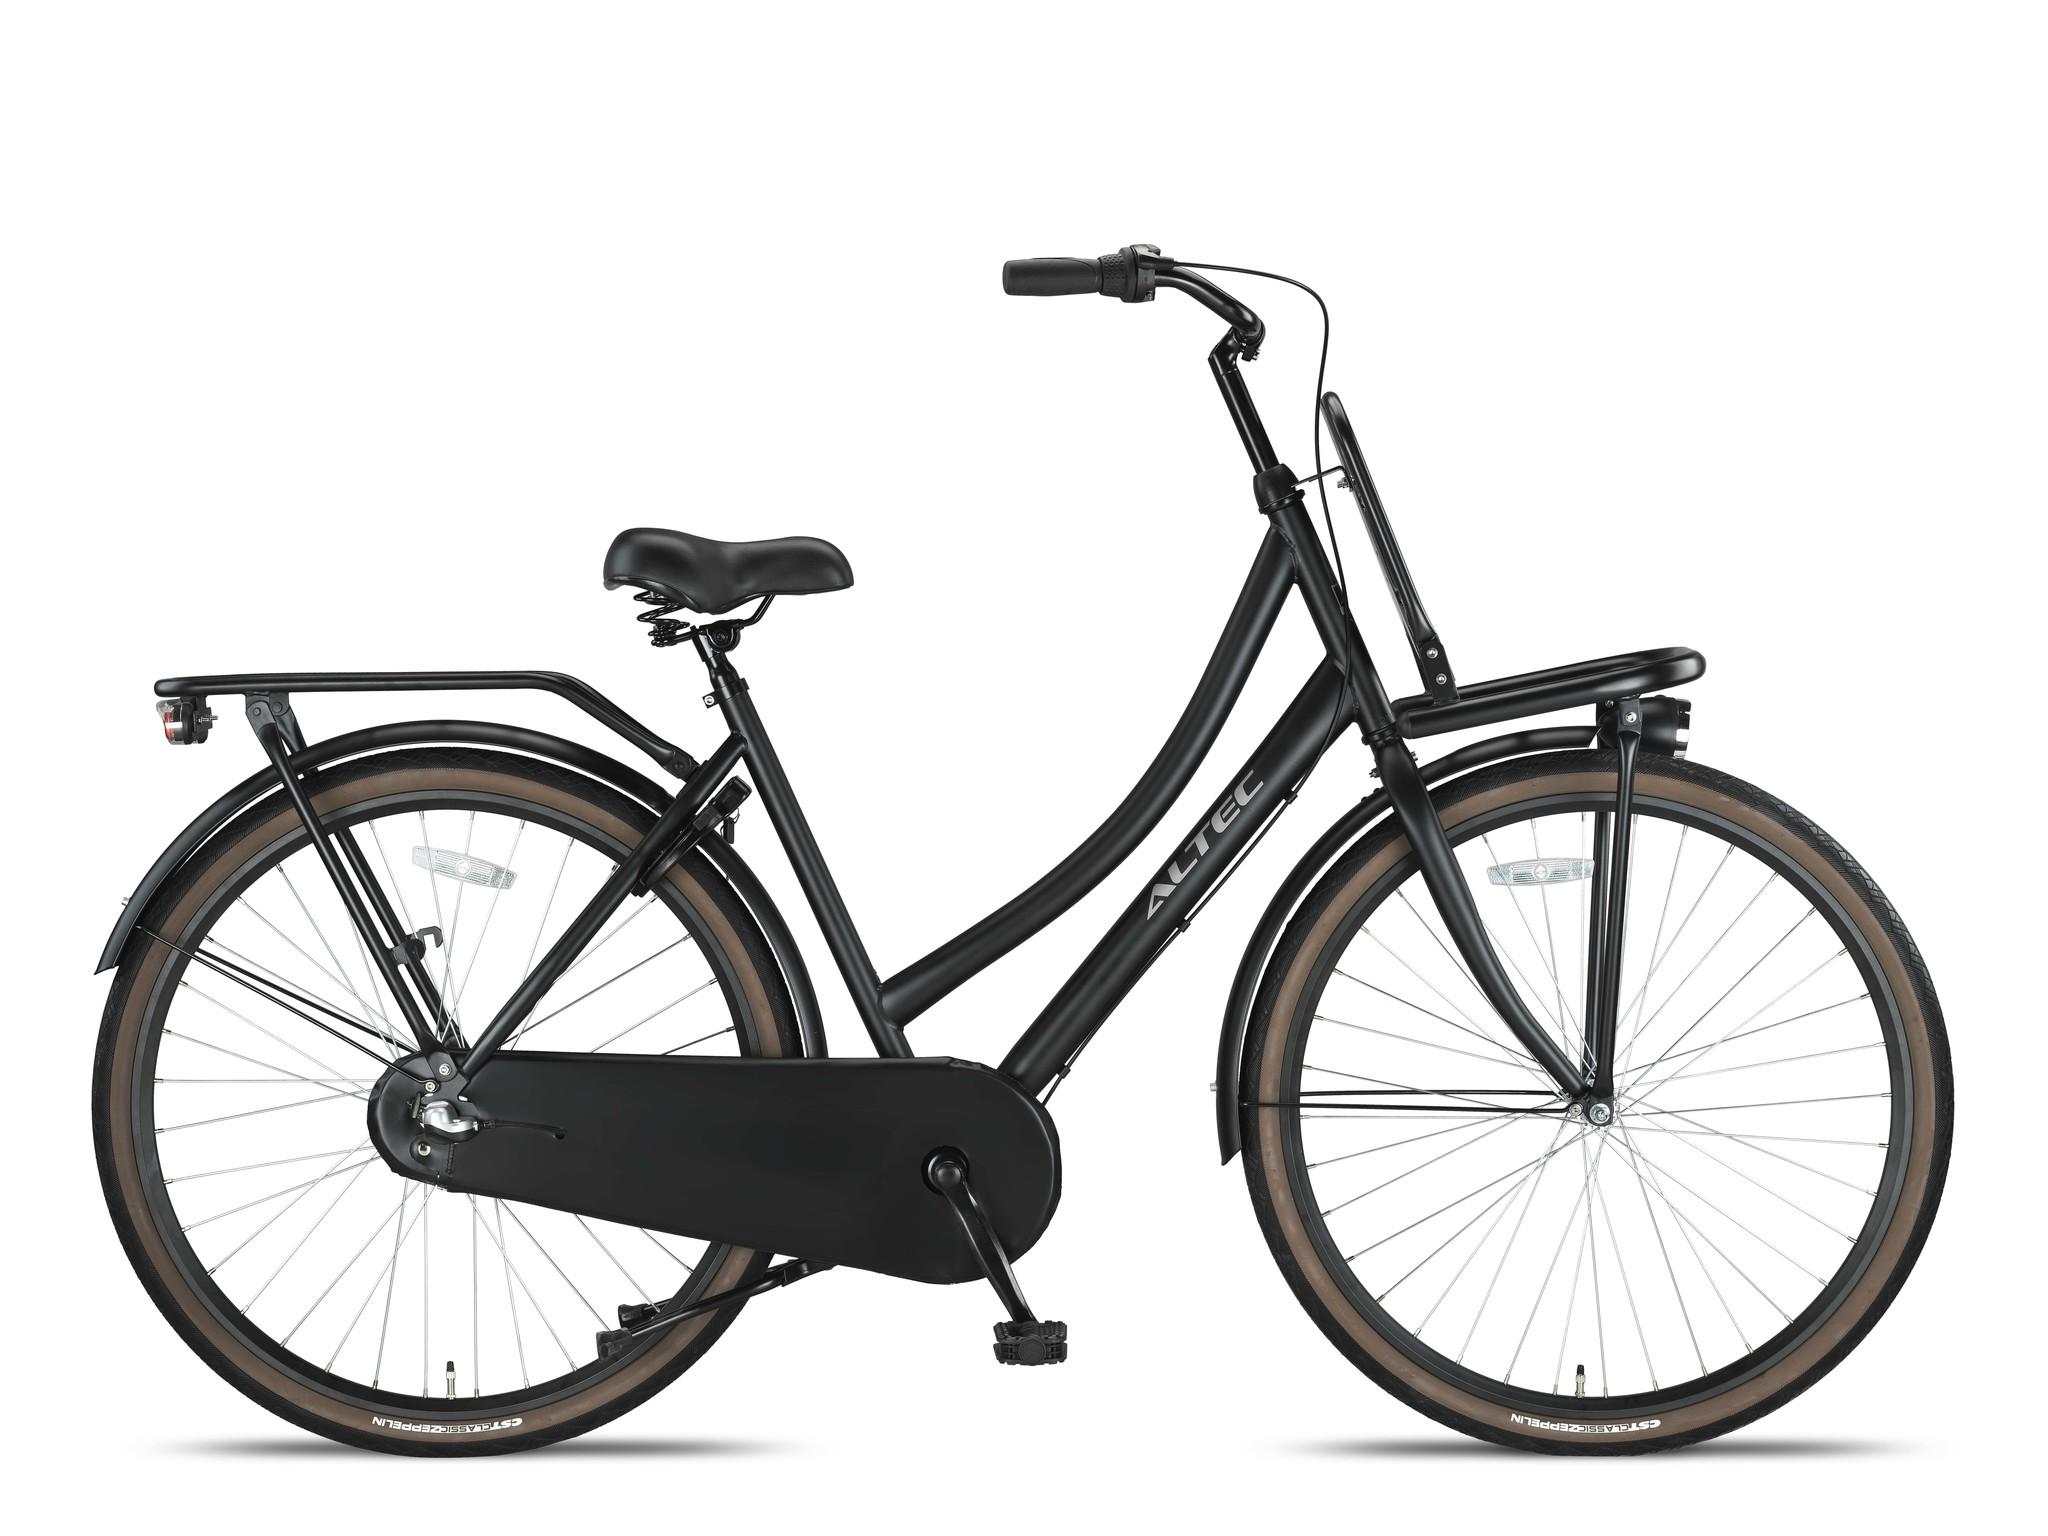 Altec Nostalgia 28 inch 53 cm Transportfiets N3 Mat Zwart online kopen